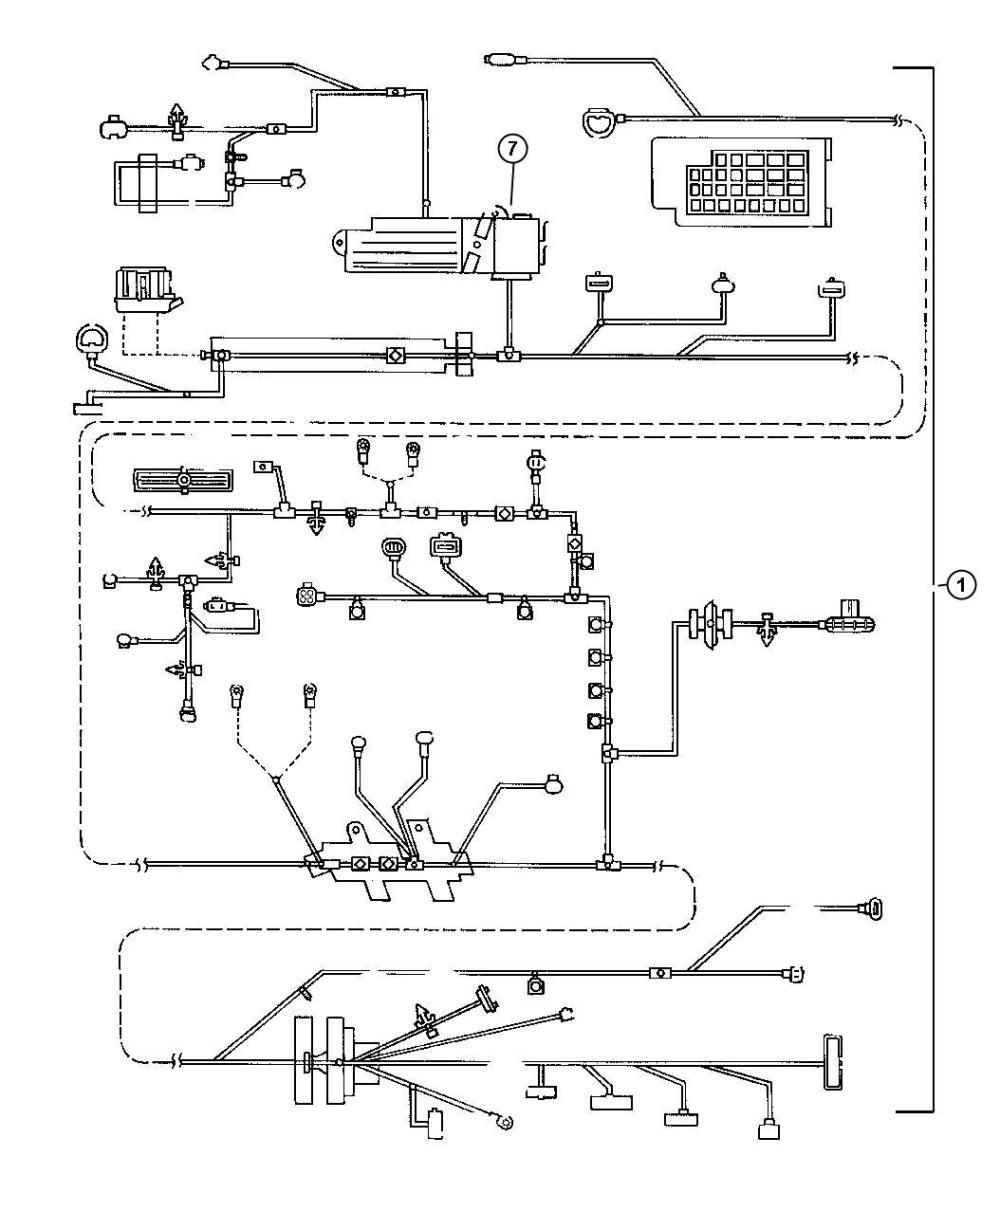 medium resolution of 02 dodge stratus 2 7 engine 05 dodge stratus fuse diagram dodge stratus wiring diagram dodge